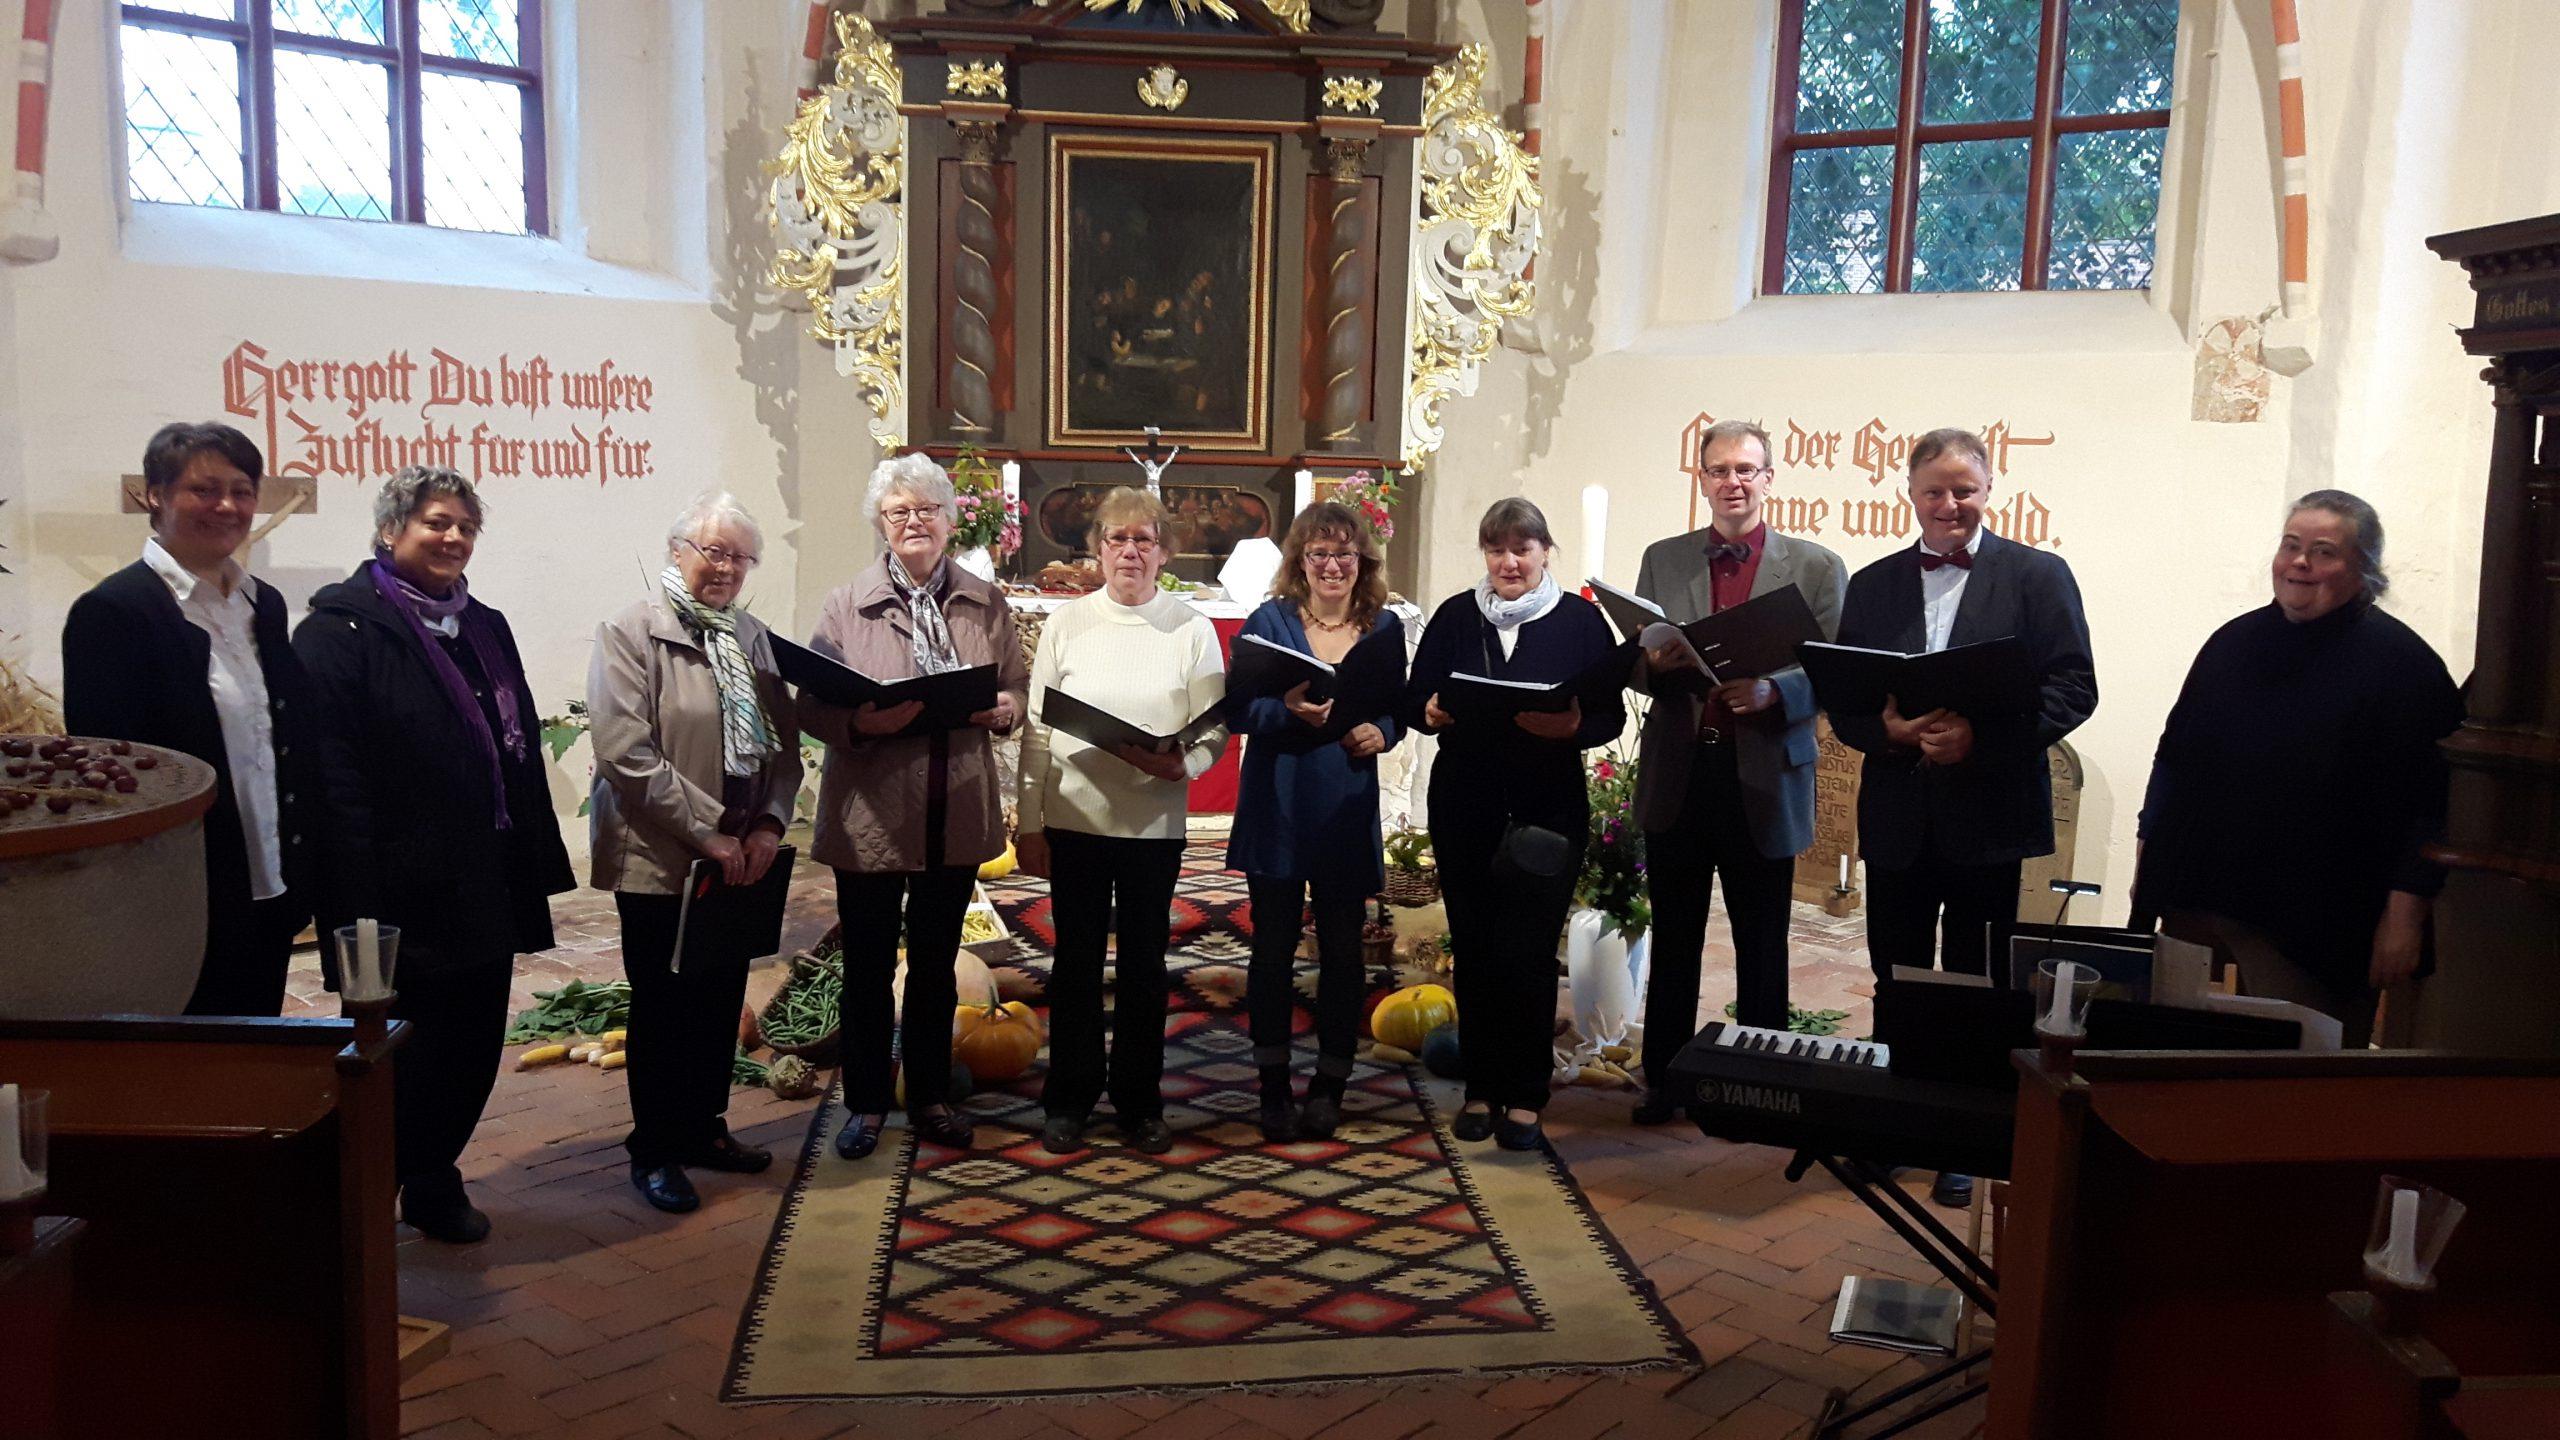 Chor Elmenhorst